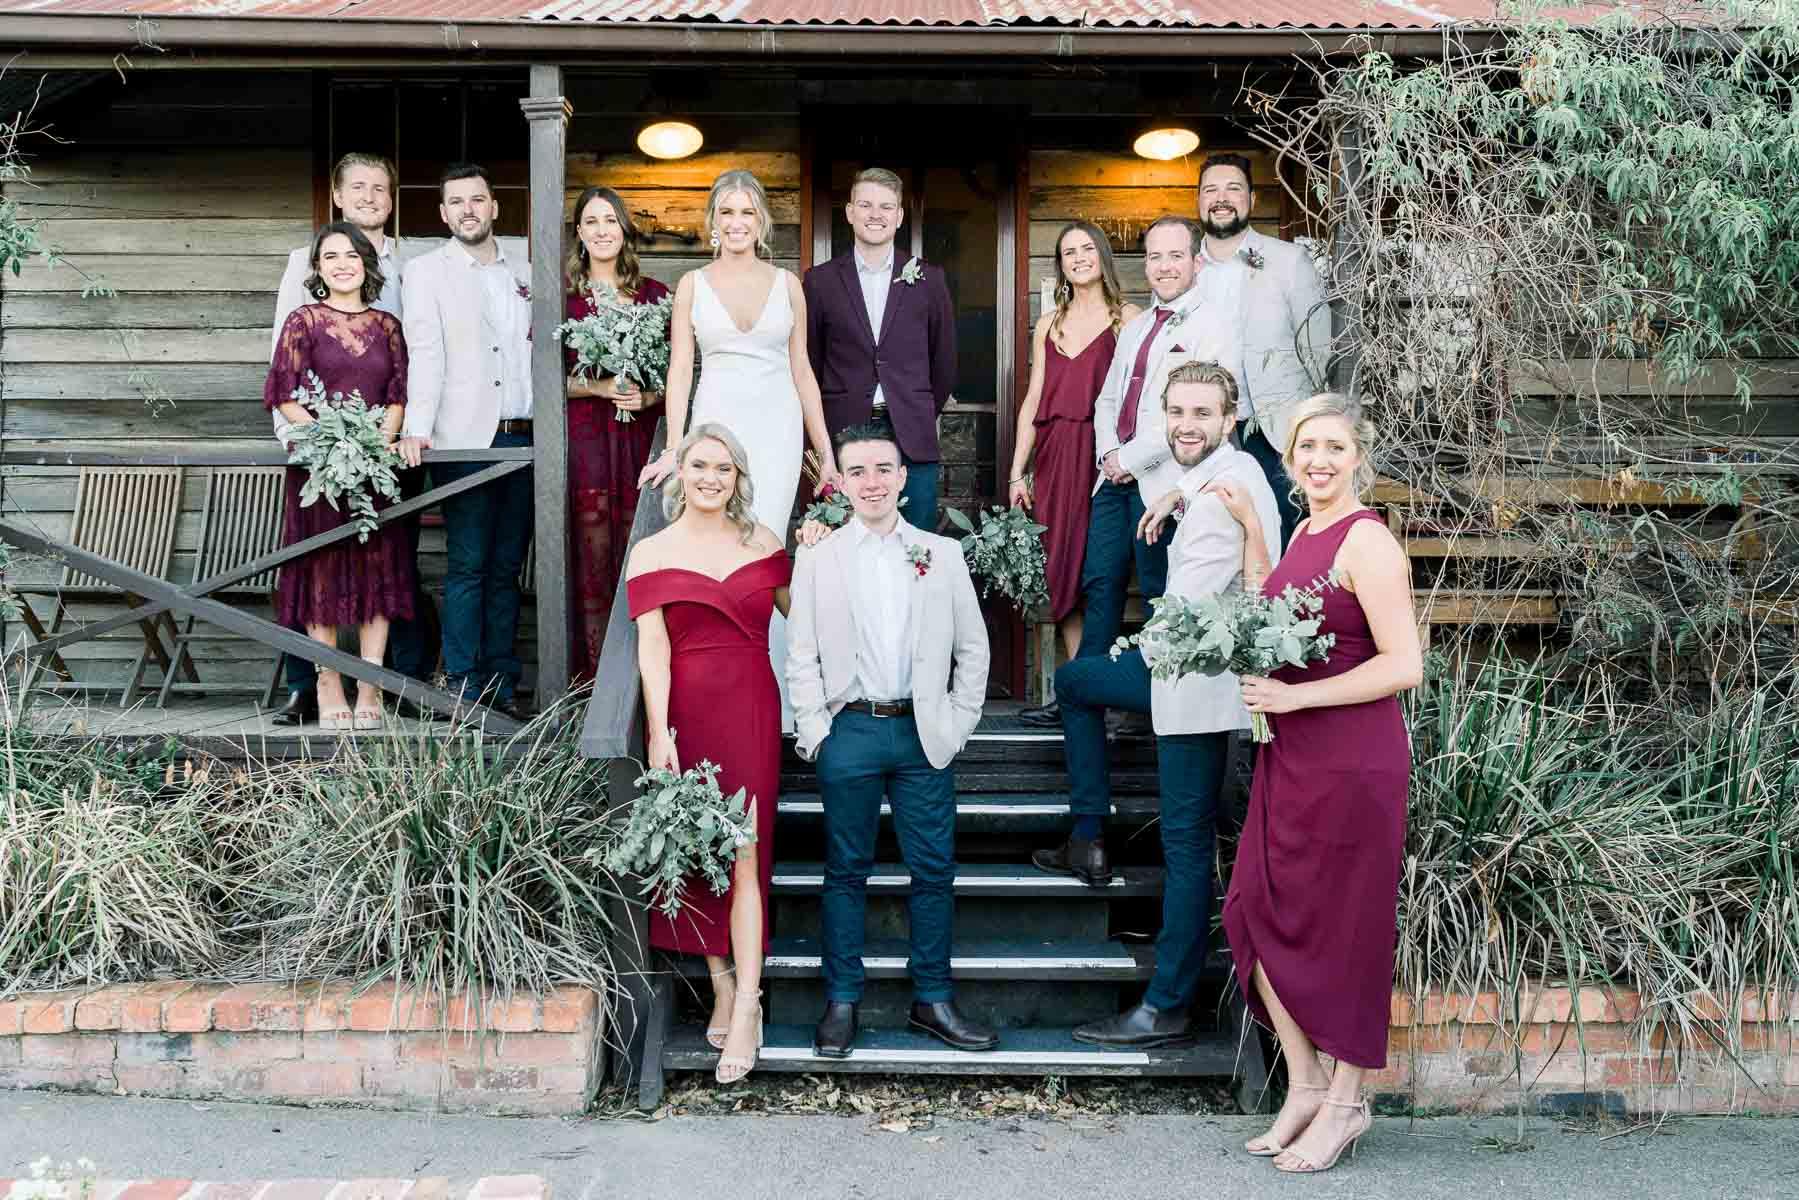 rustic-yarra-valley-wedding-venue-acacia-ridge-georgia-james-08189.jpg